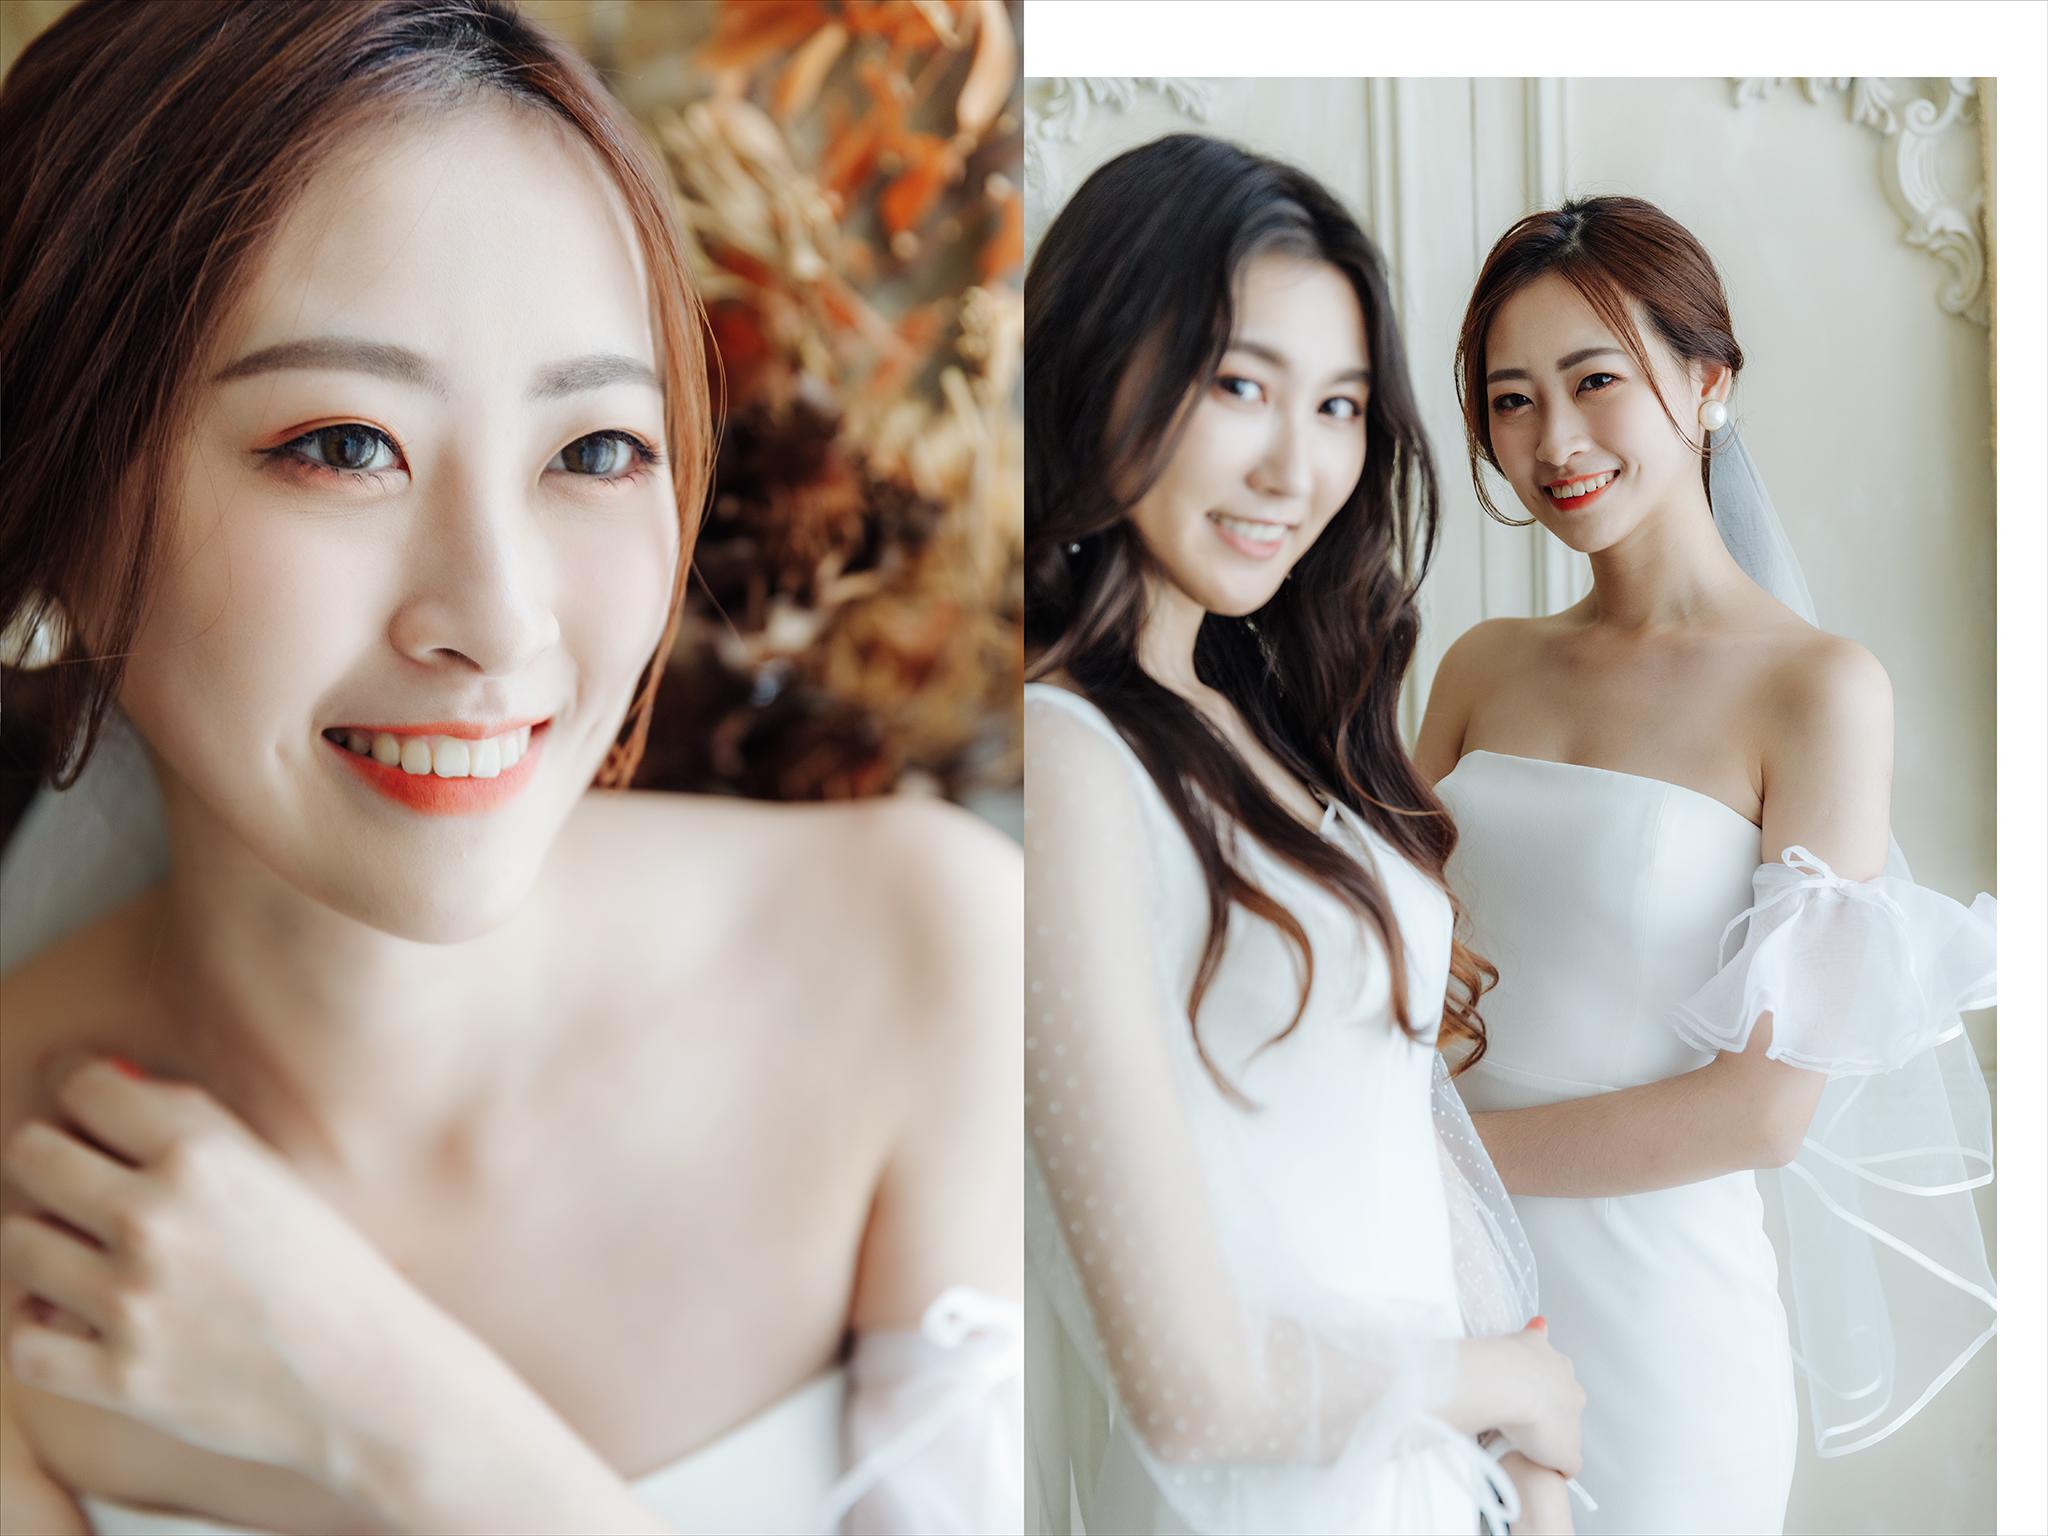 49929556727 f7cf4d2799 o - 【閨蜜婚紗】+Jessy & Tiffany+